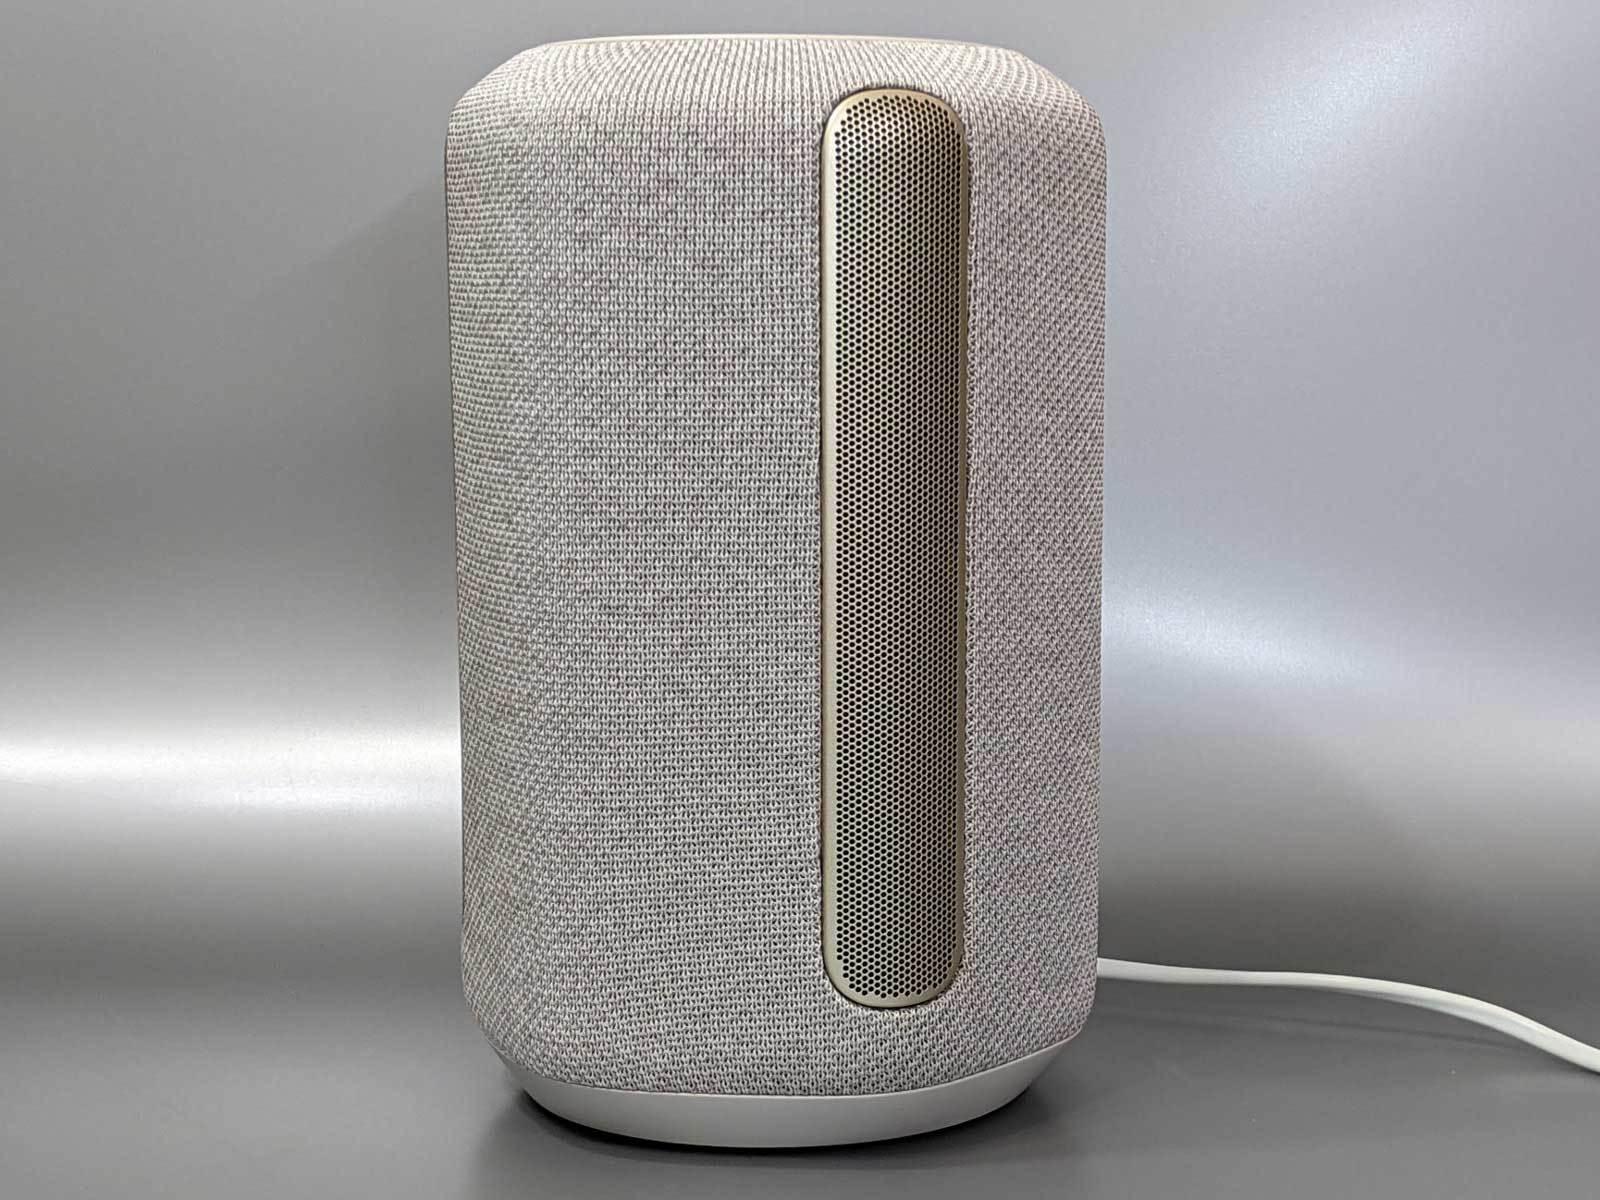 [ITmedia PC USER] 別格のサウンドを楽しめるワイヤレススピーカーで360 Reality Audioを試す